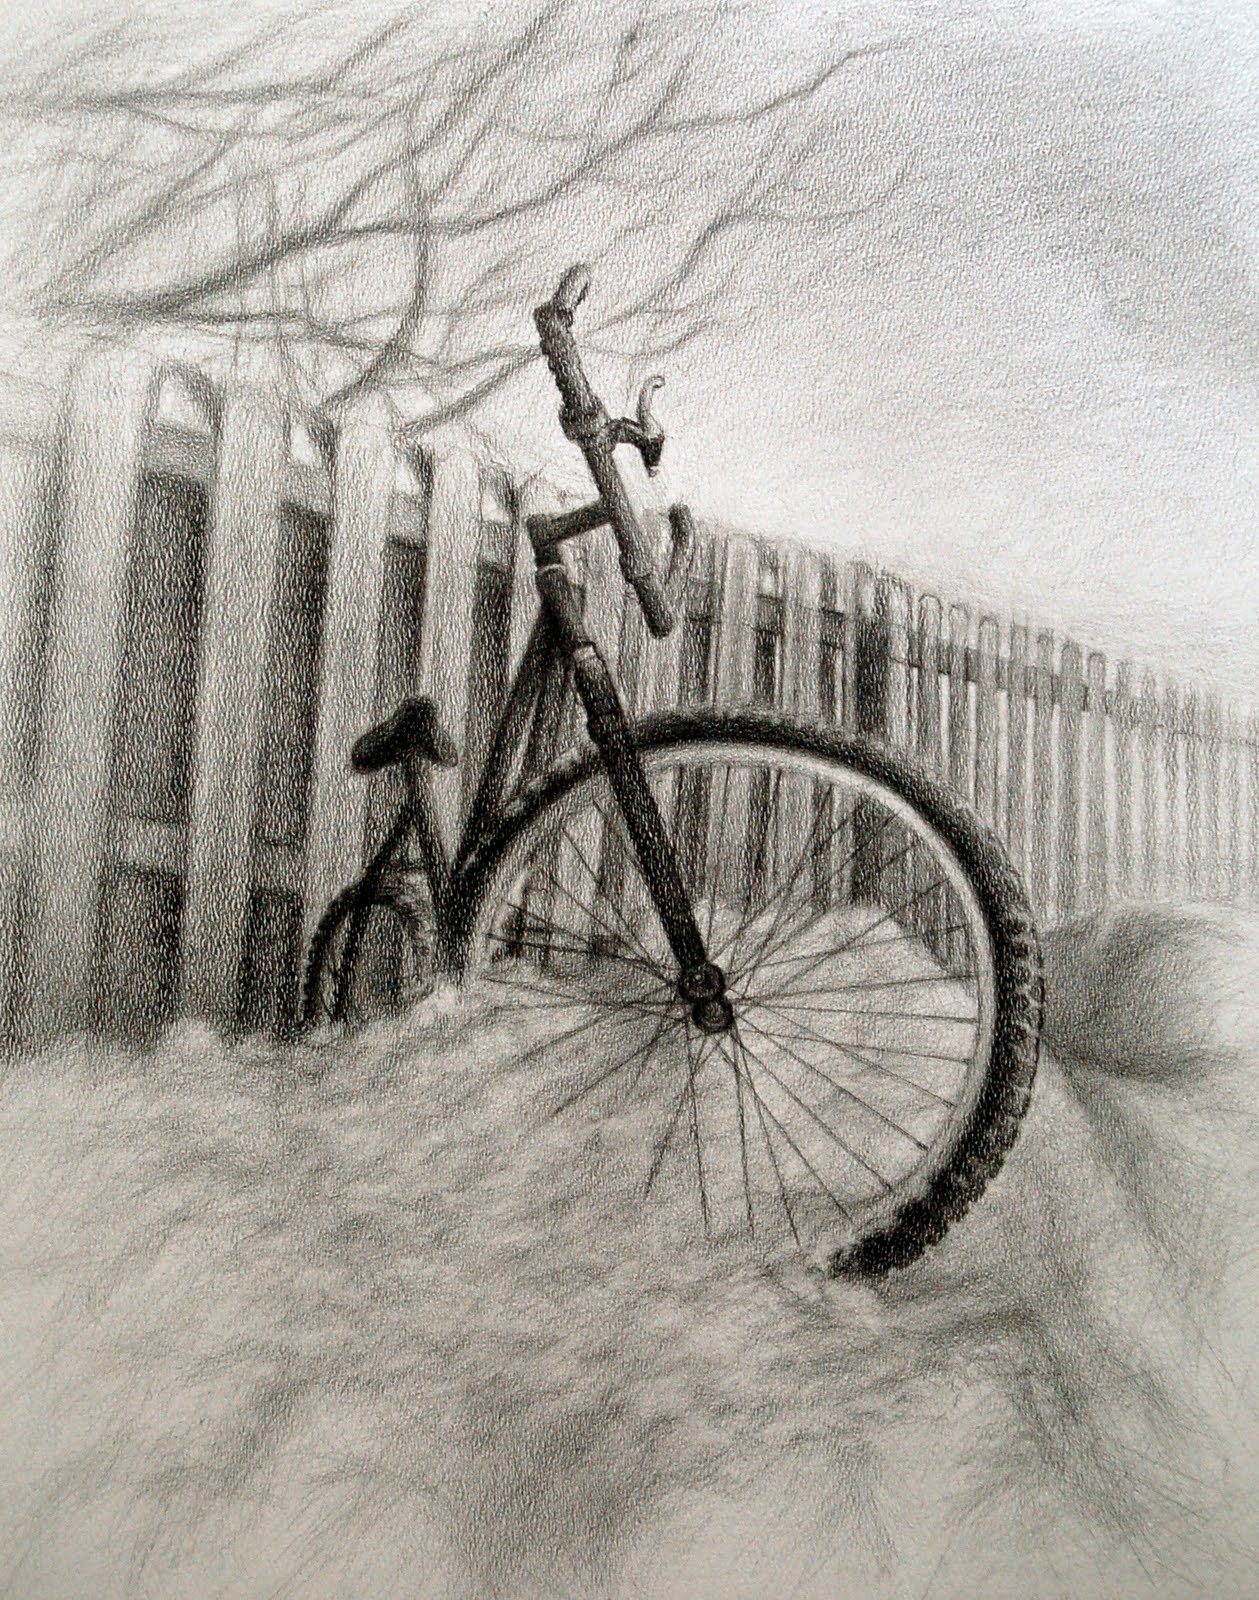 Risd Bike Peter Bertucci